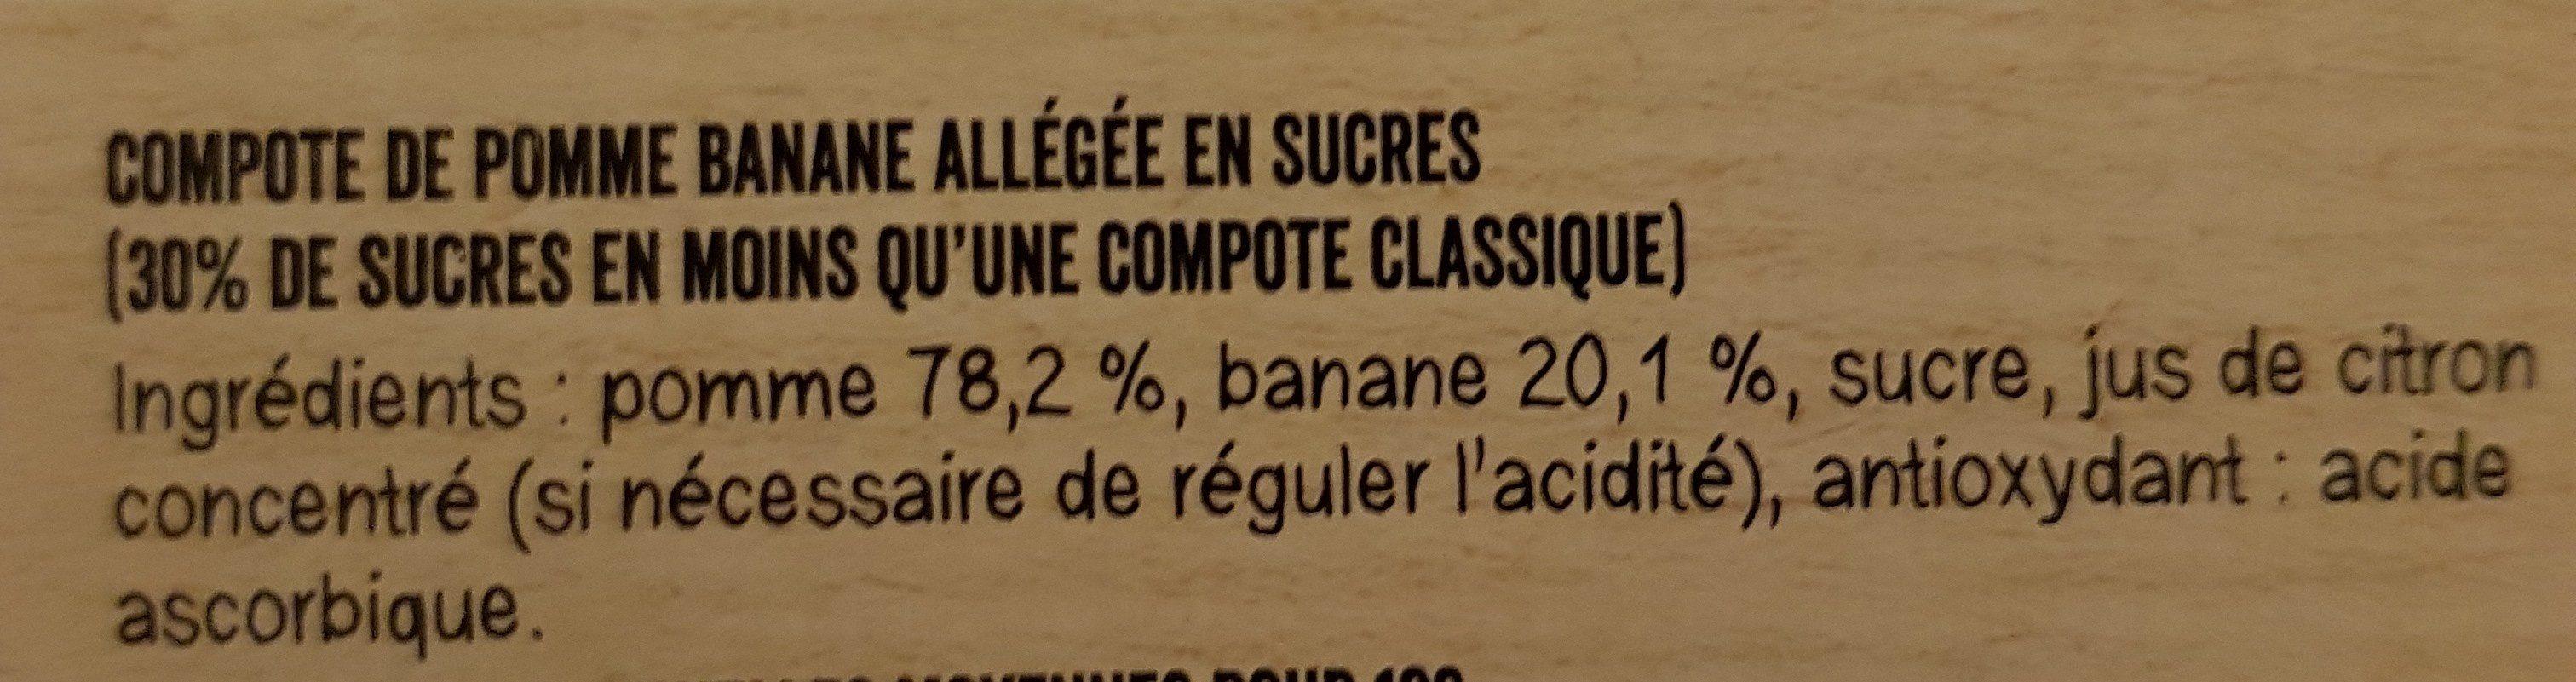 MATERNE Pomme/Pomme Abricot/Pomme Banane/Pomme Pêche 16x100g - Ingrédients - fr